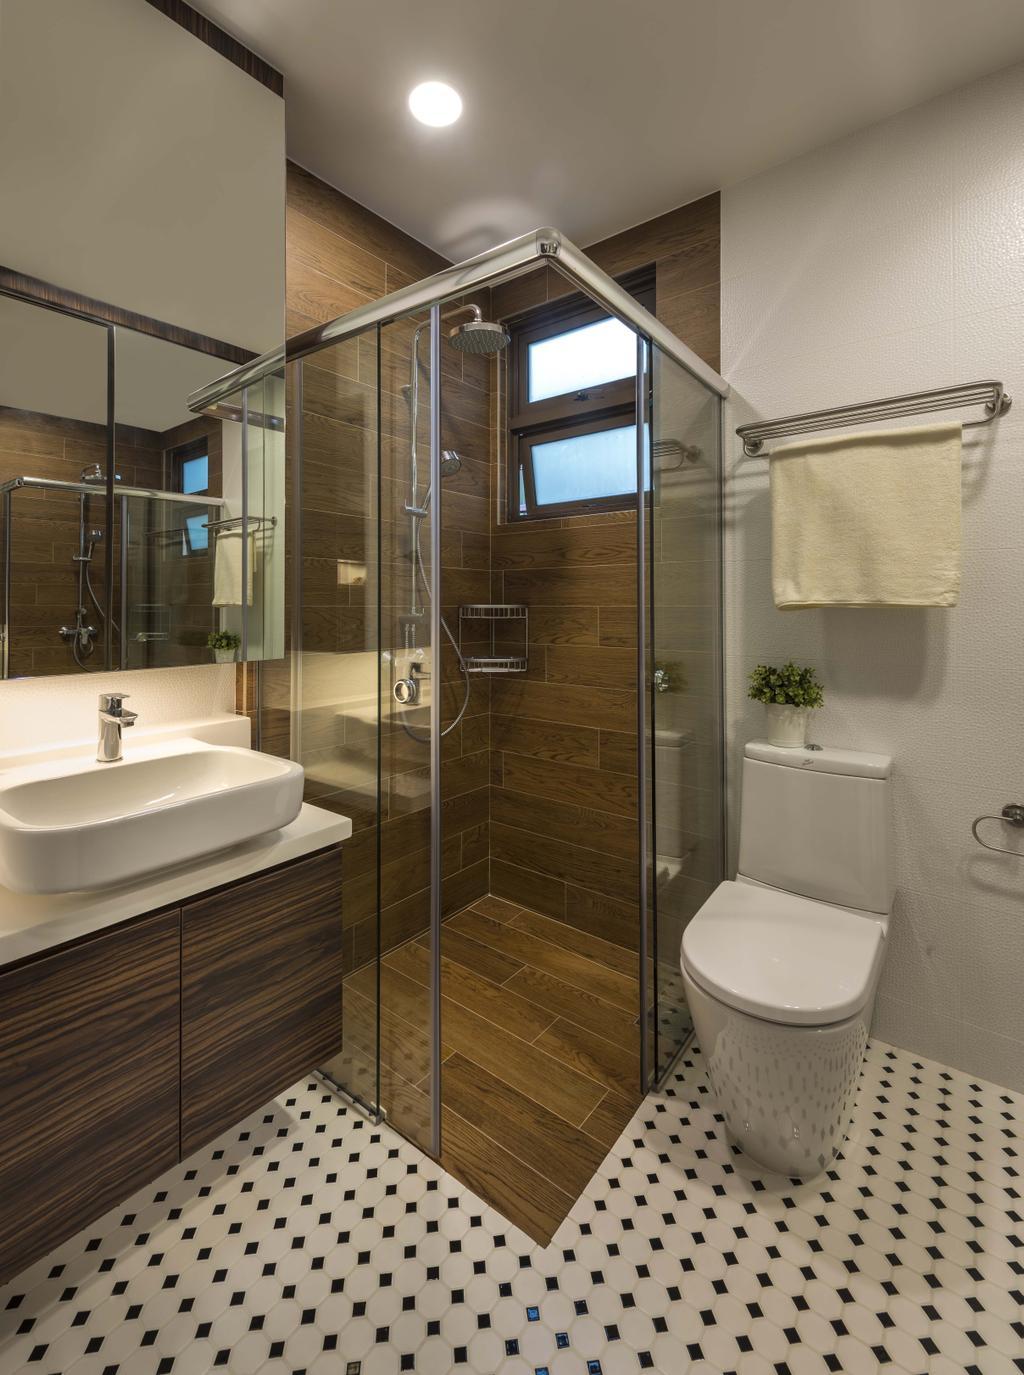 Scandinavian, HDB, Bathroom, 20 Marymount Terrace (Boon View), Interior Designer, Imposed Design, Pola Dot Floor, Modern Contemporary Bathroom, Recessed Lights, Wooden Bathroom Cabinet, Wooden Floor